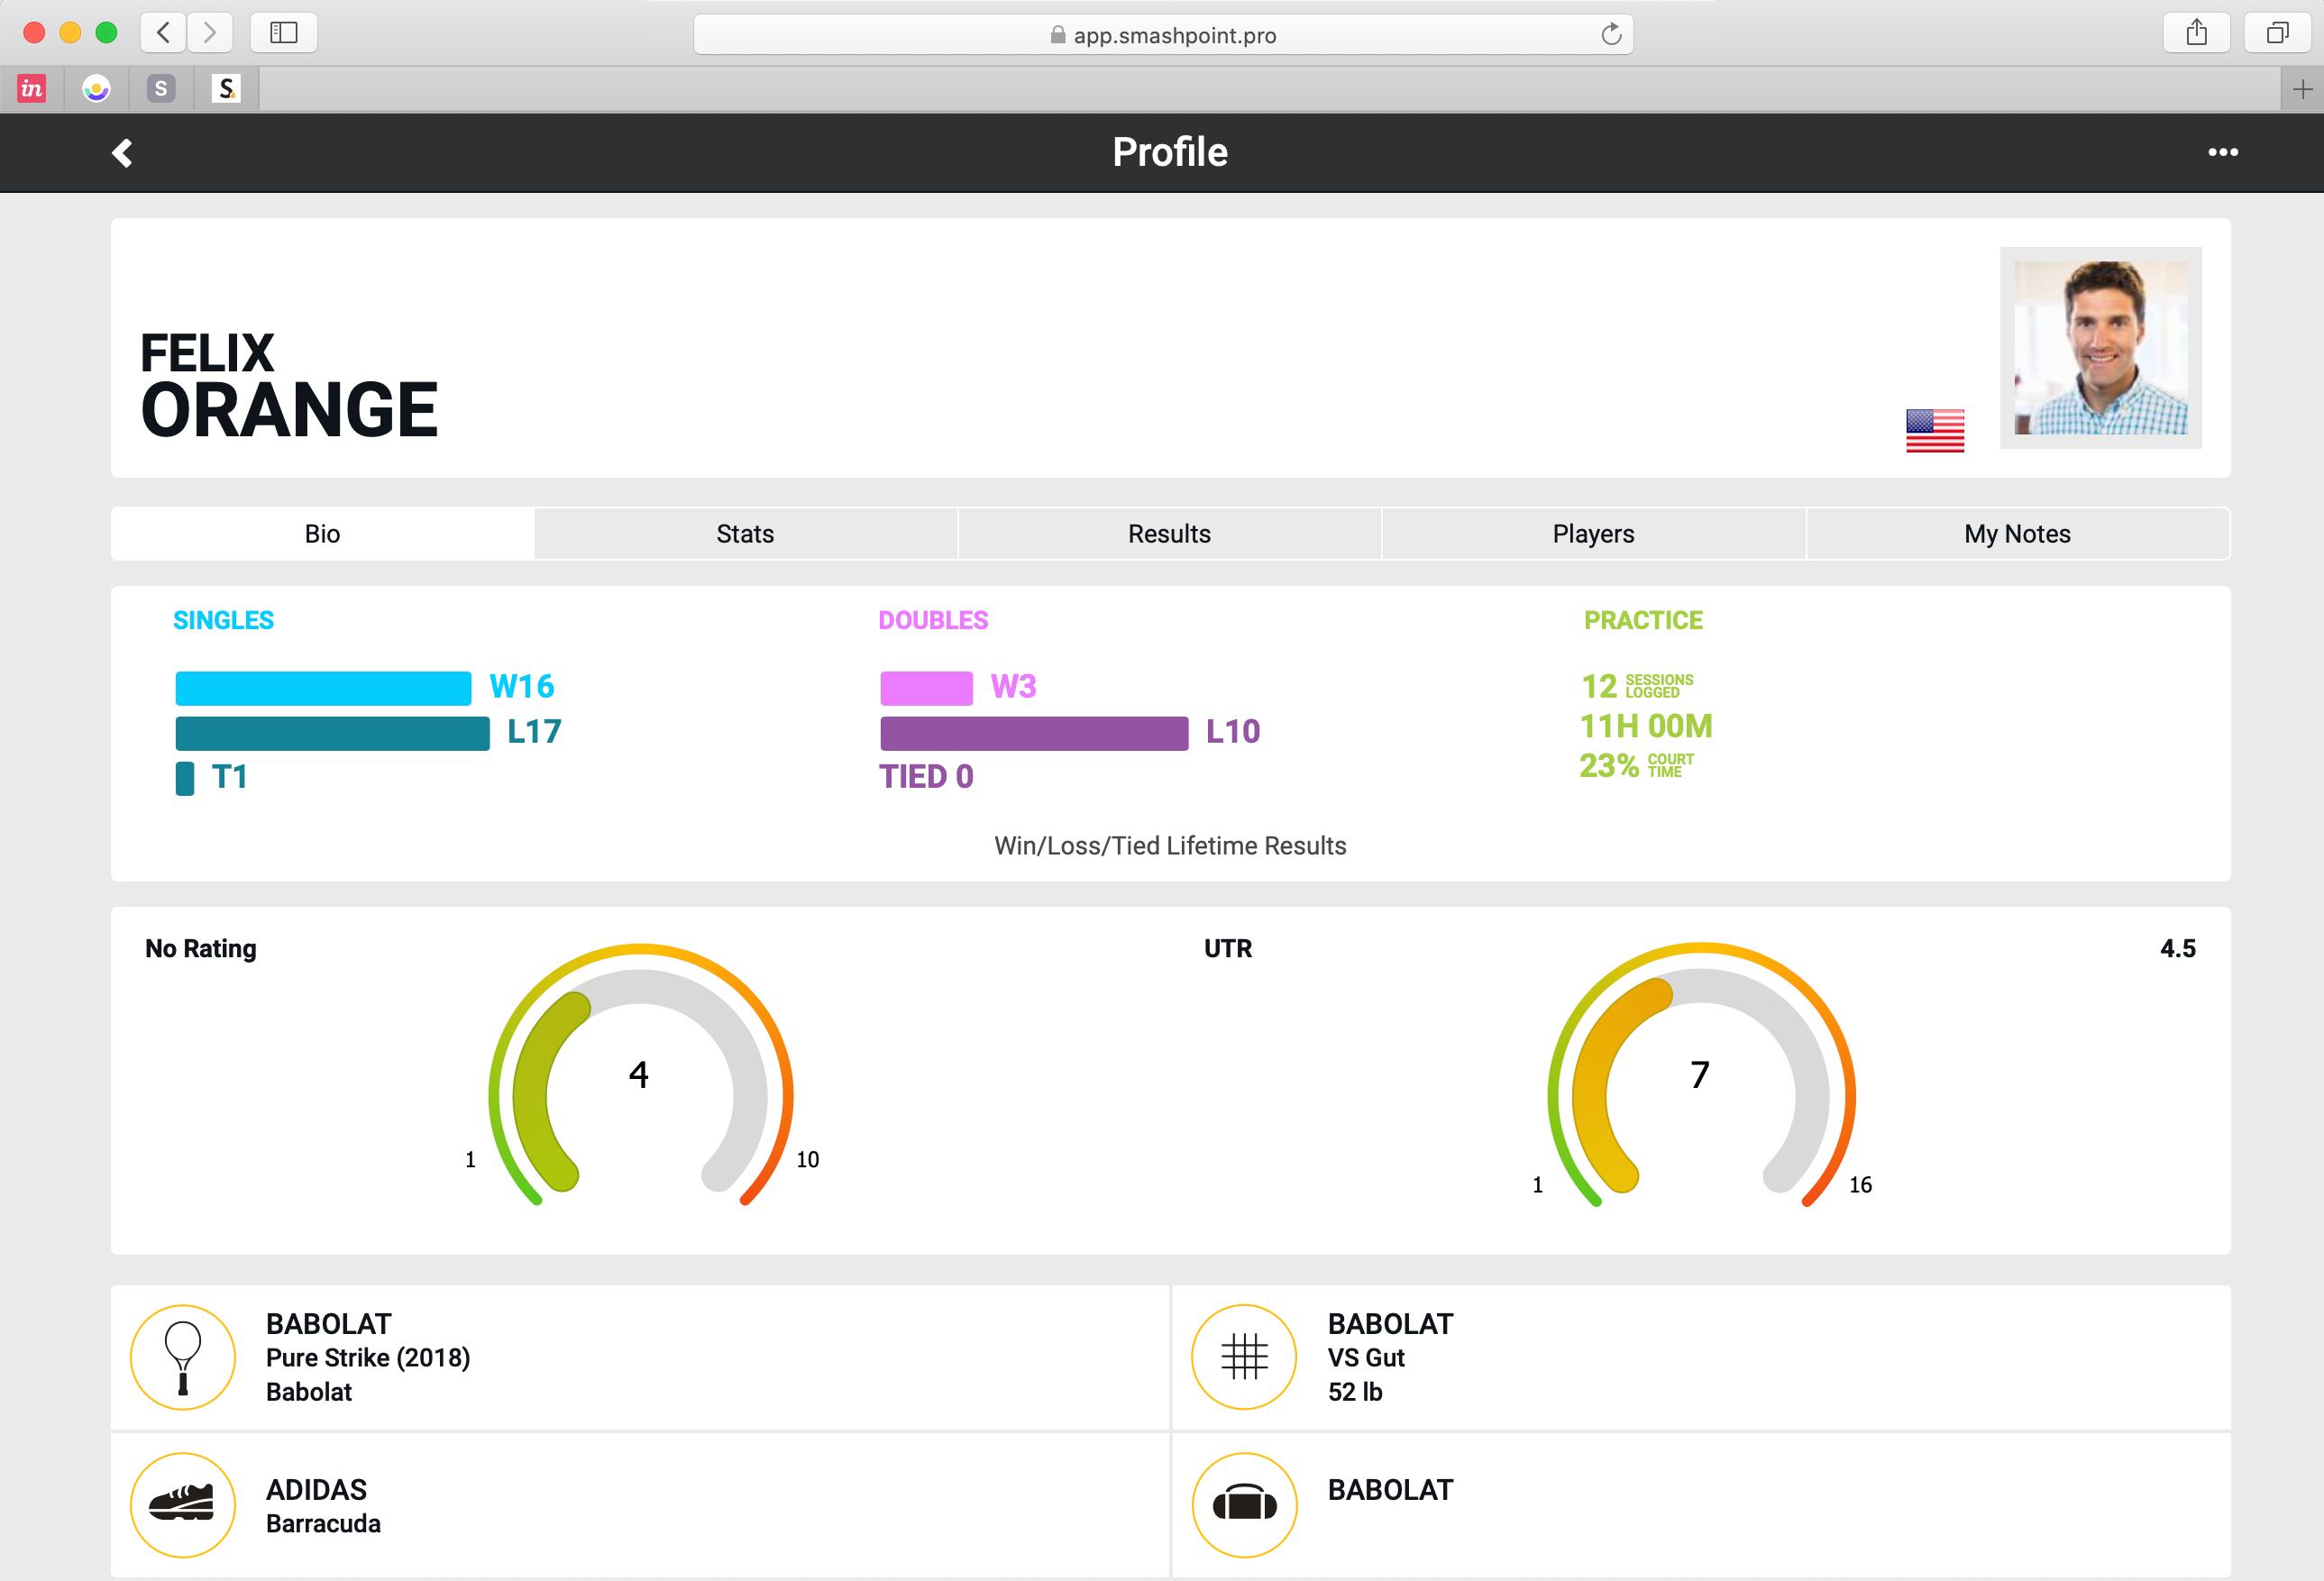 Smashpoint Web App Player Profile